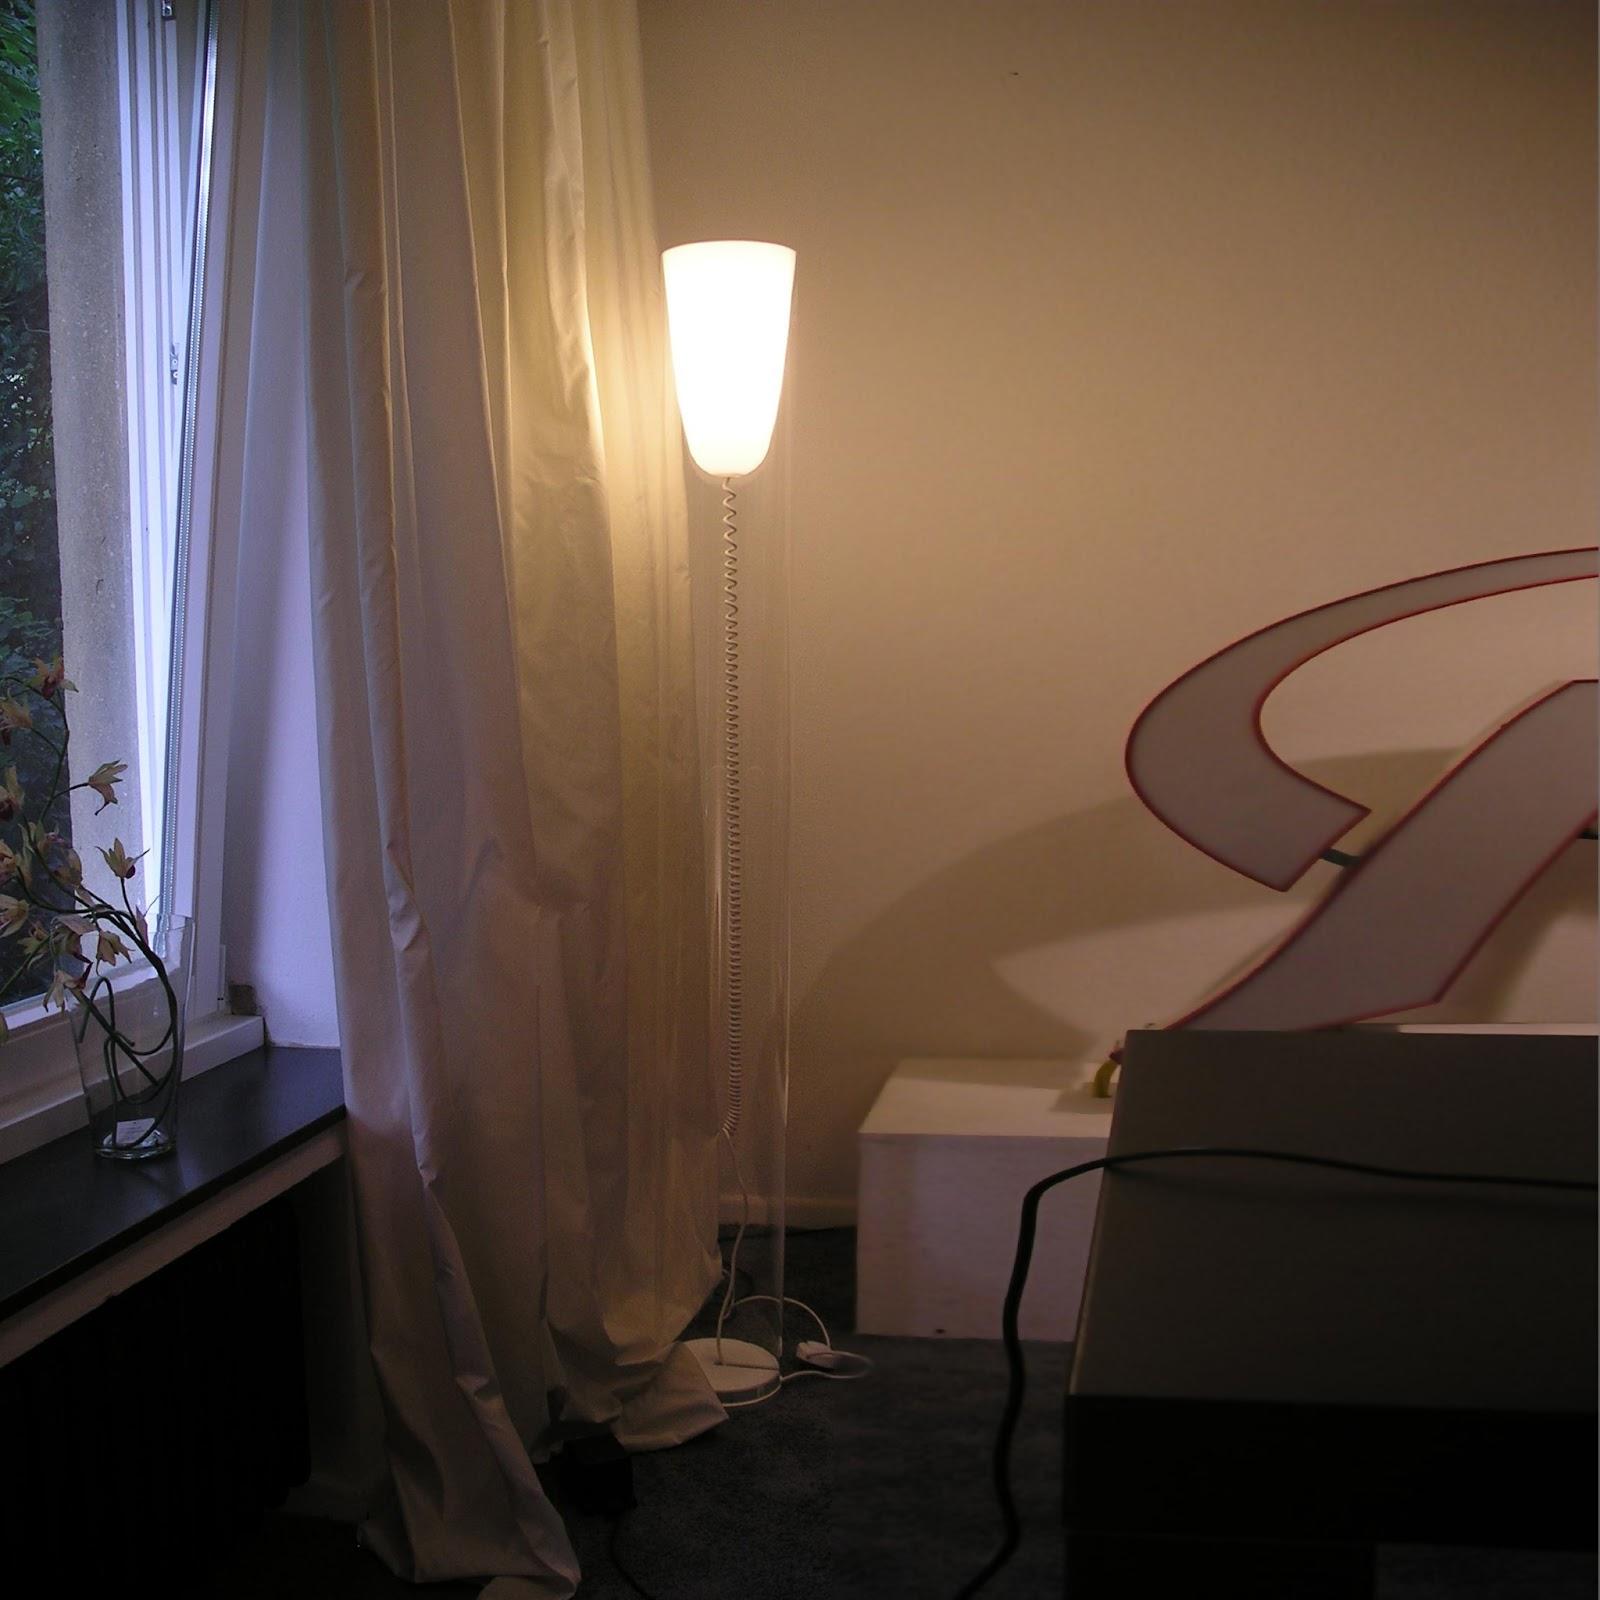 Modern Quot Toobe Quot Ferruccio Laviani Kartell Toobe Floor Lamp